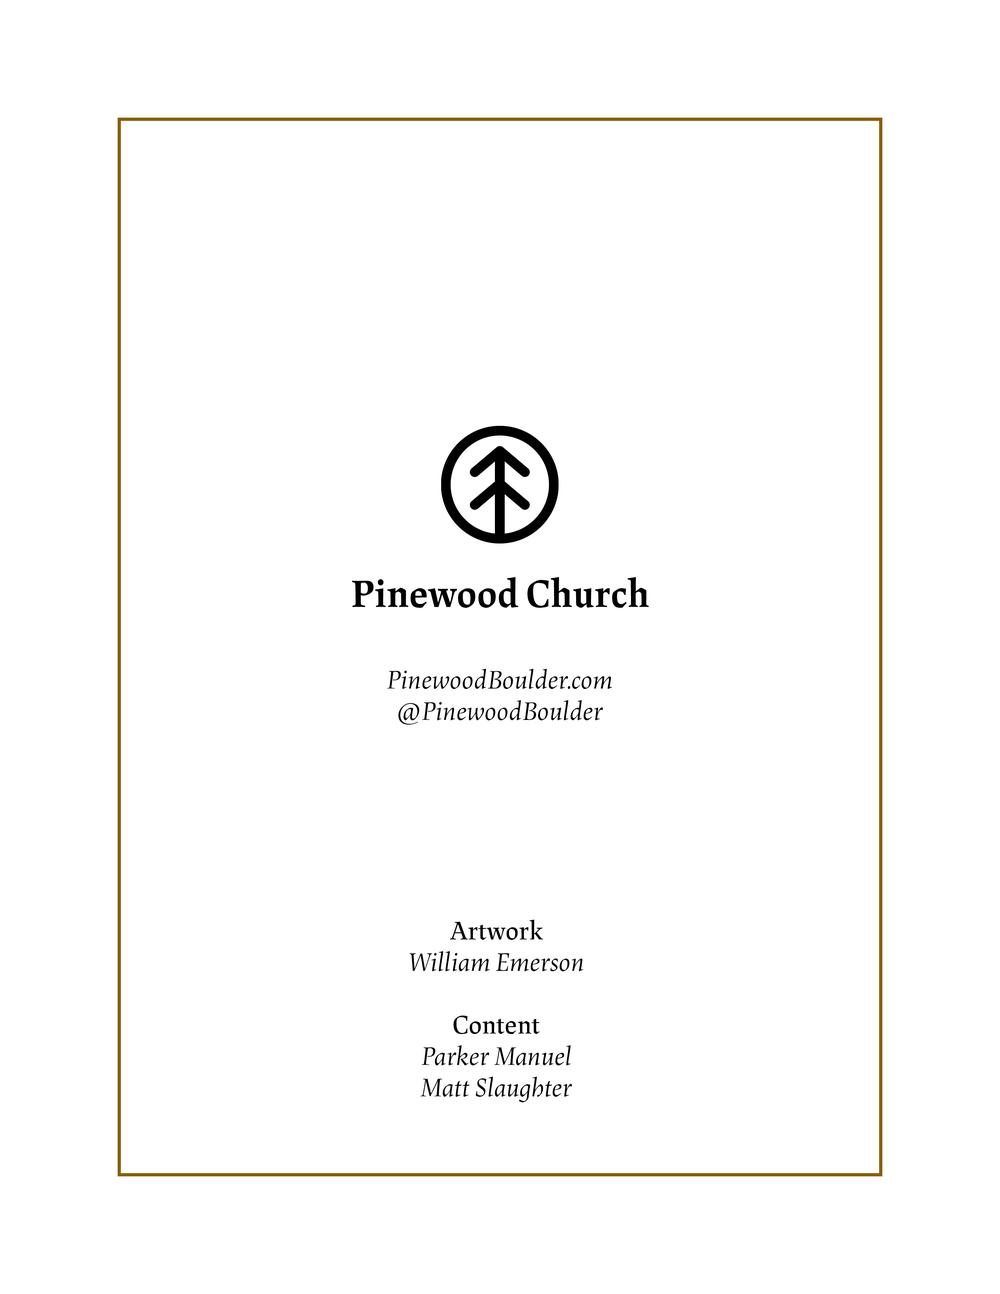 21DaysOfPrayerAndFasting_Pinewood_201952.png